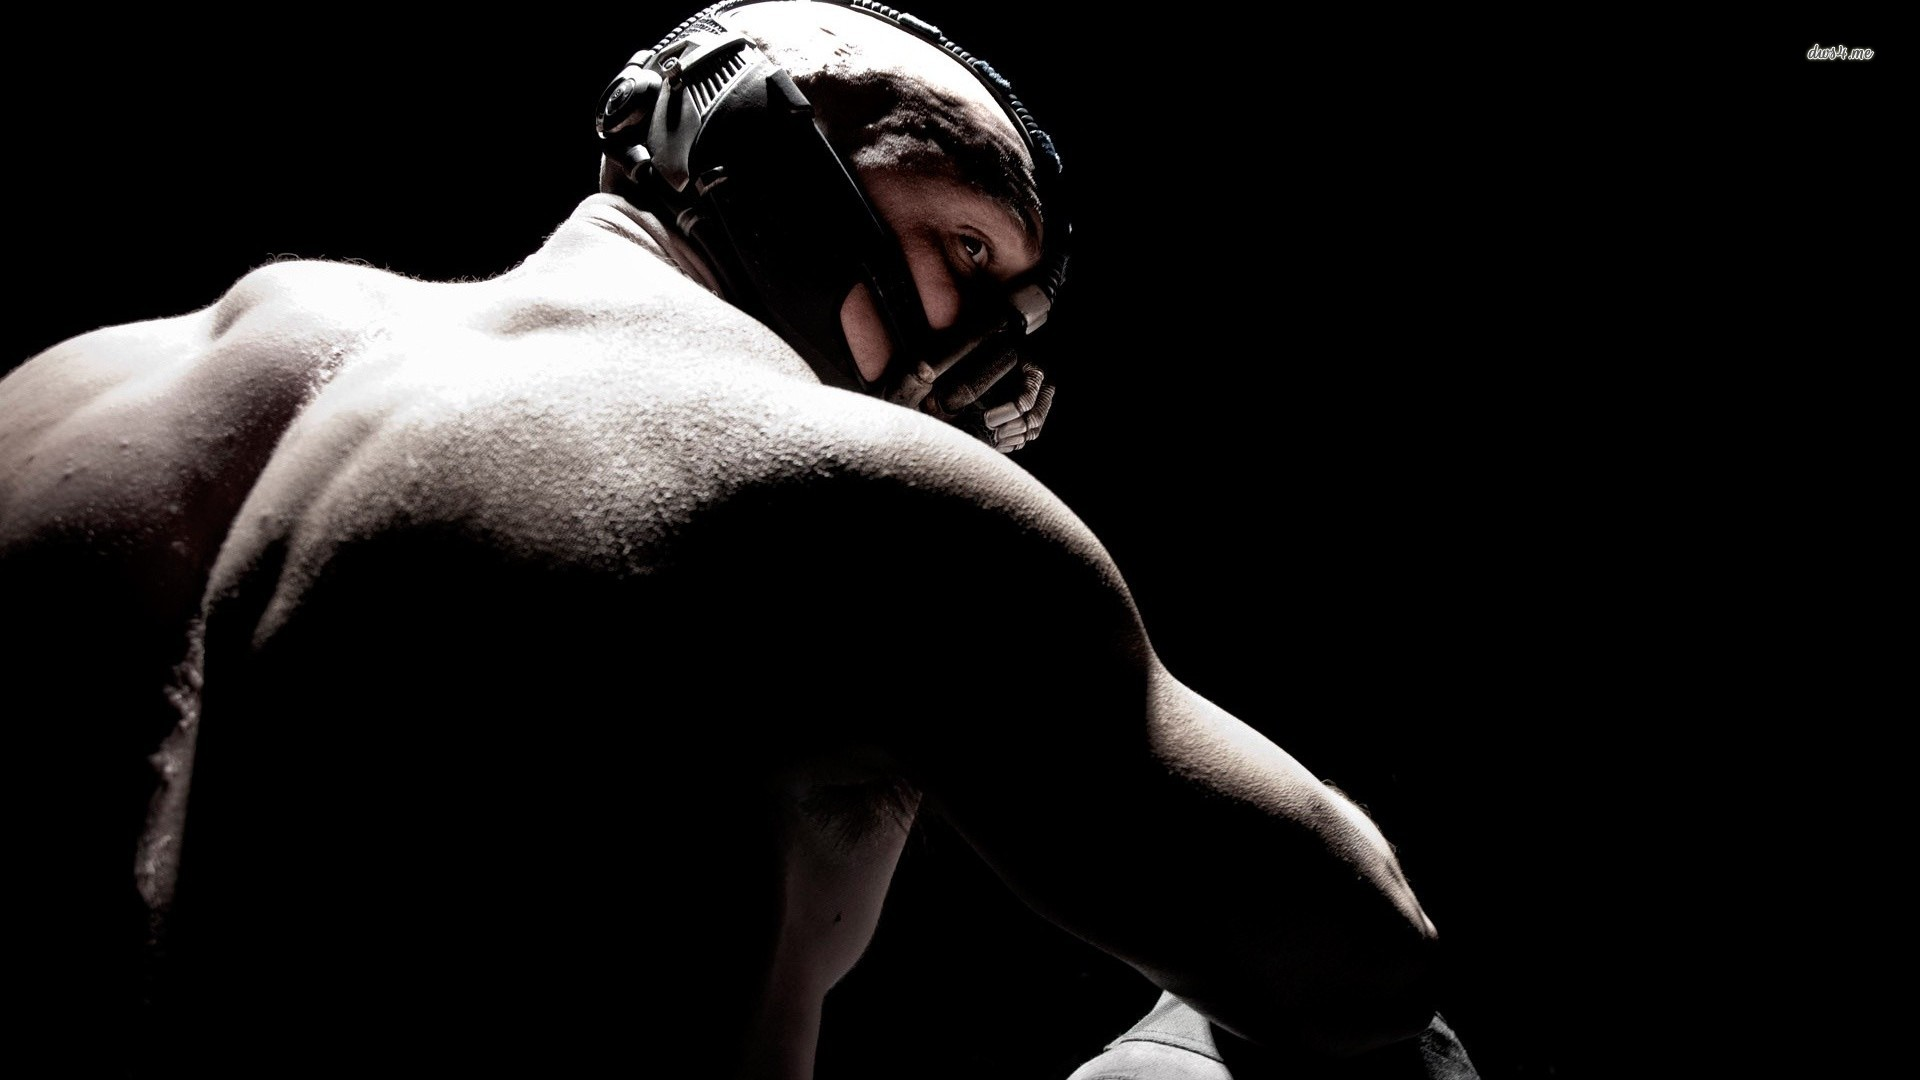 Bane Dark Knight Rises Tom Hardy Mutually